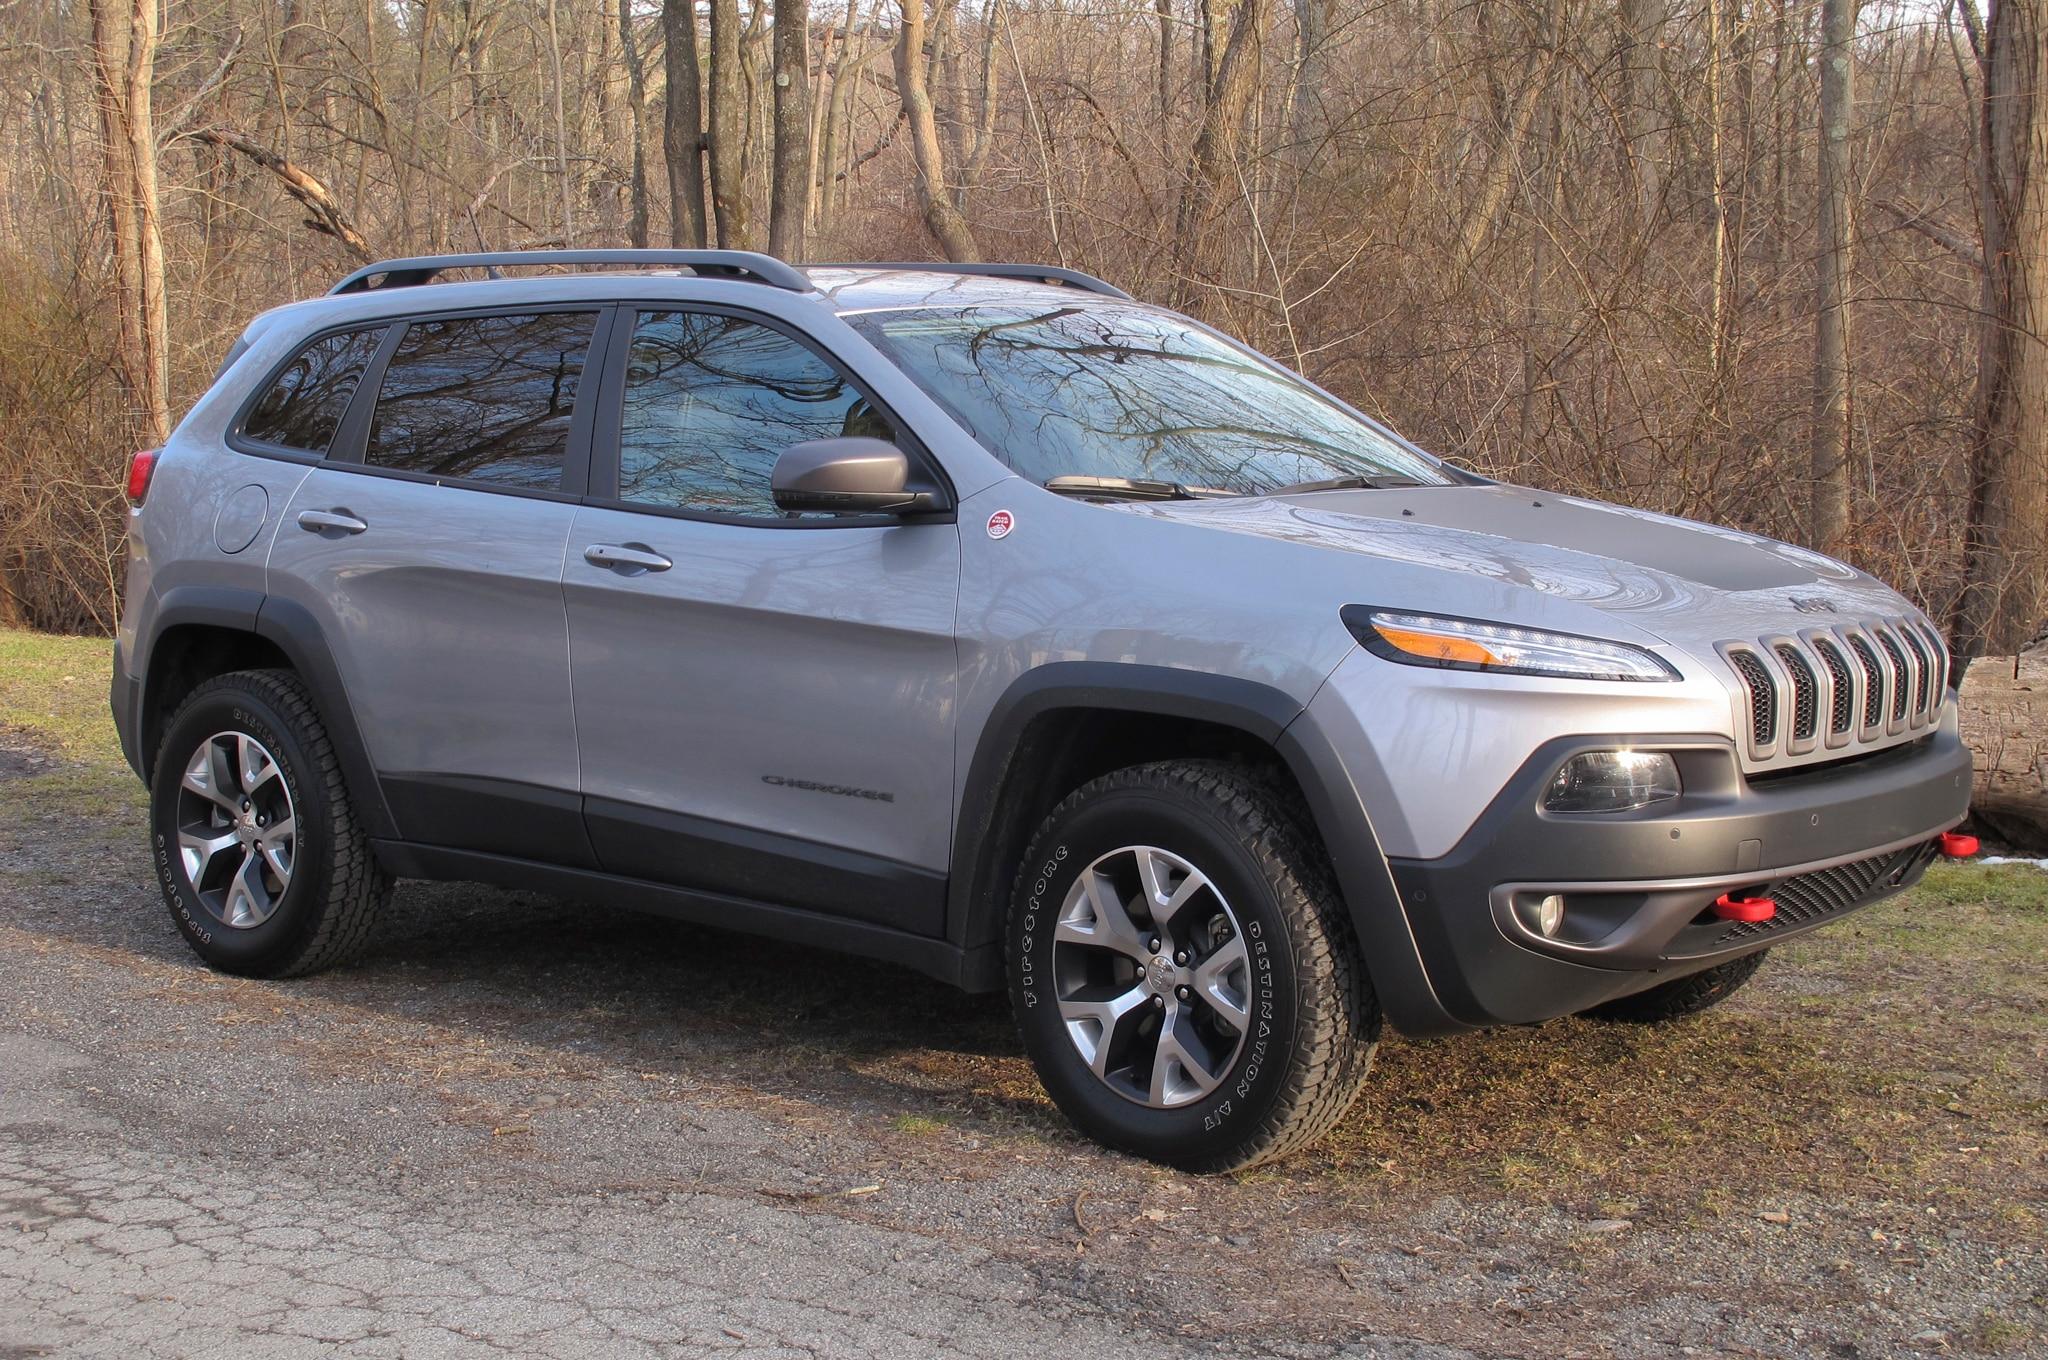 2014 Jeep Cherokee Trailhawk Front Three Quarter1